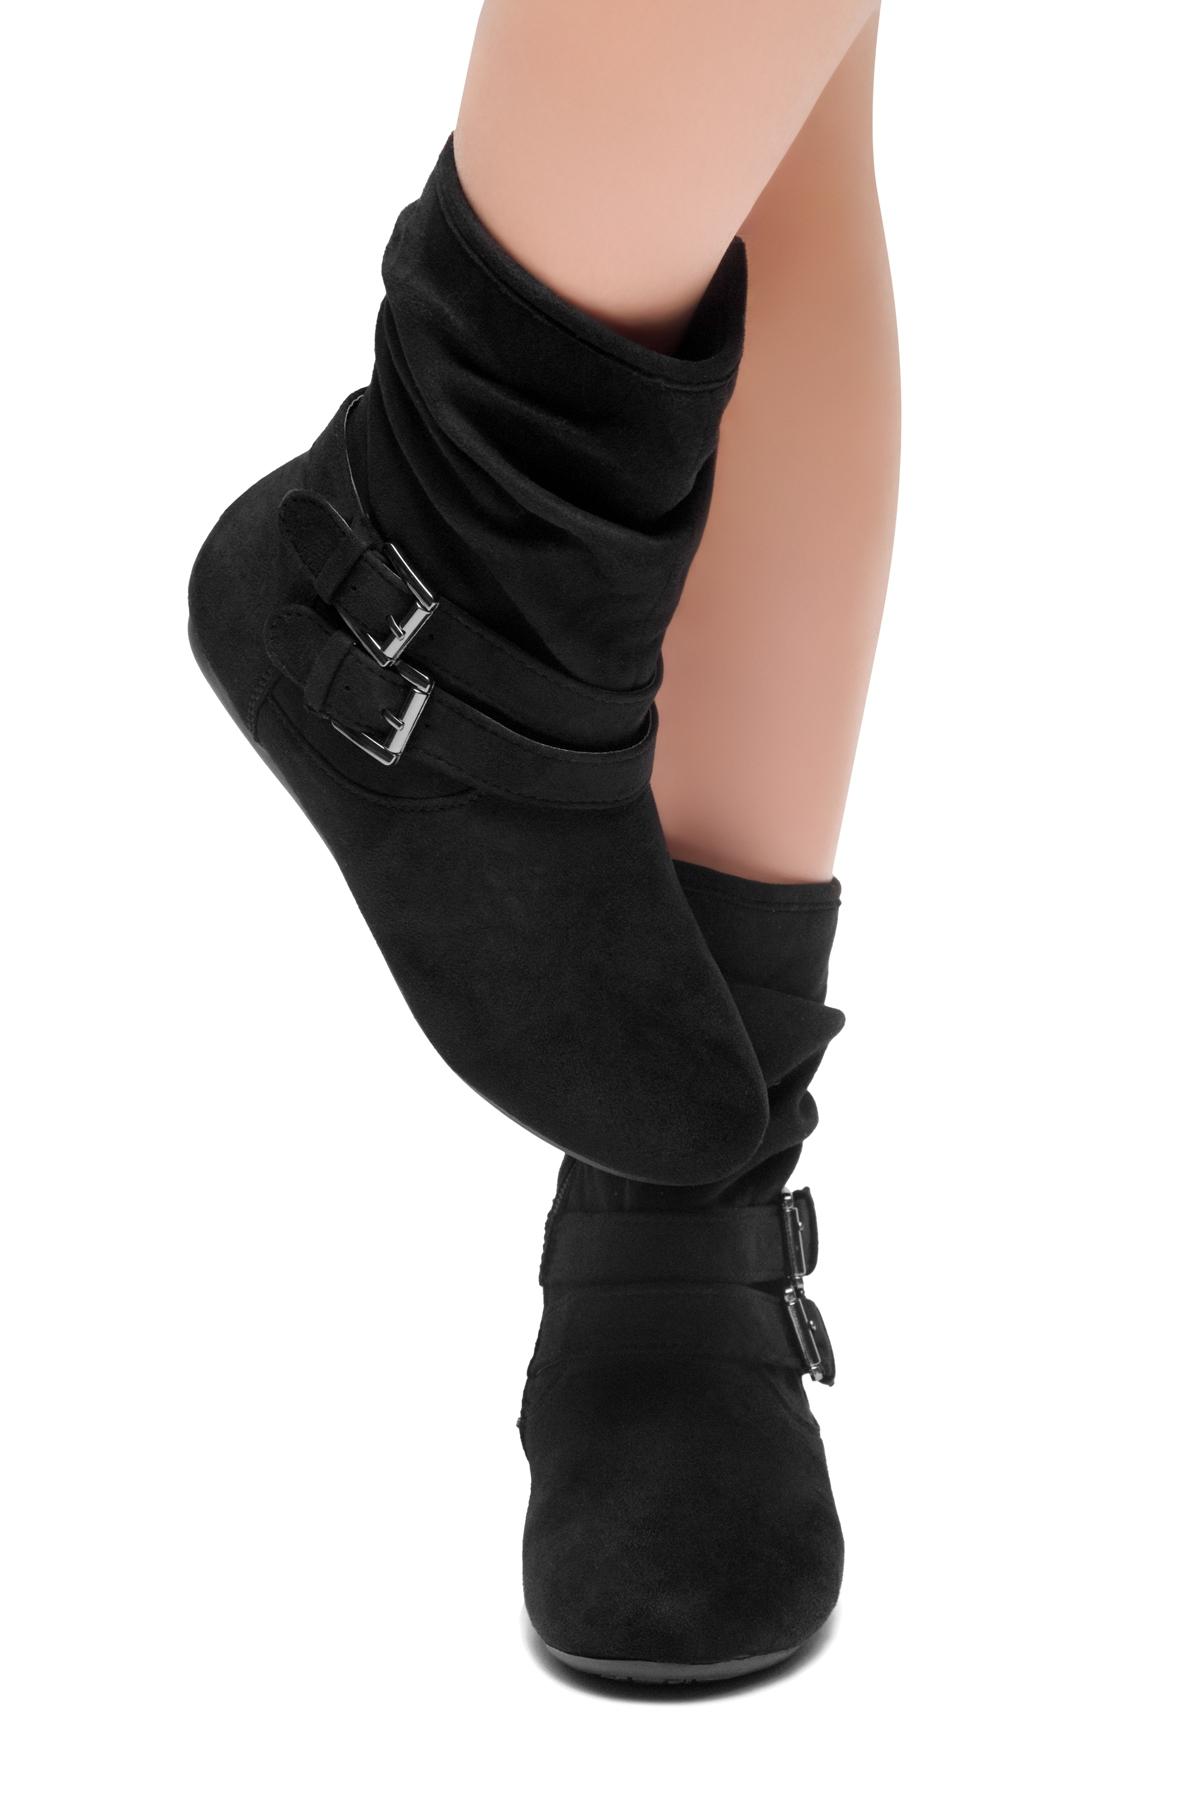 04ffee2571b60d Women s Black Lindell Women s Fashion Calf Flat Heel Side Zipper ...